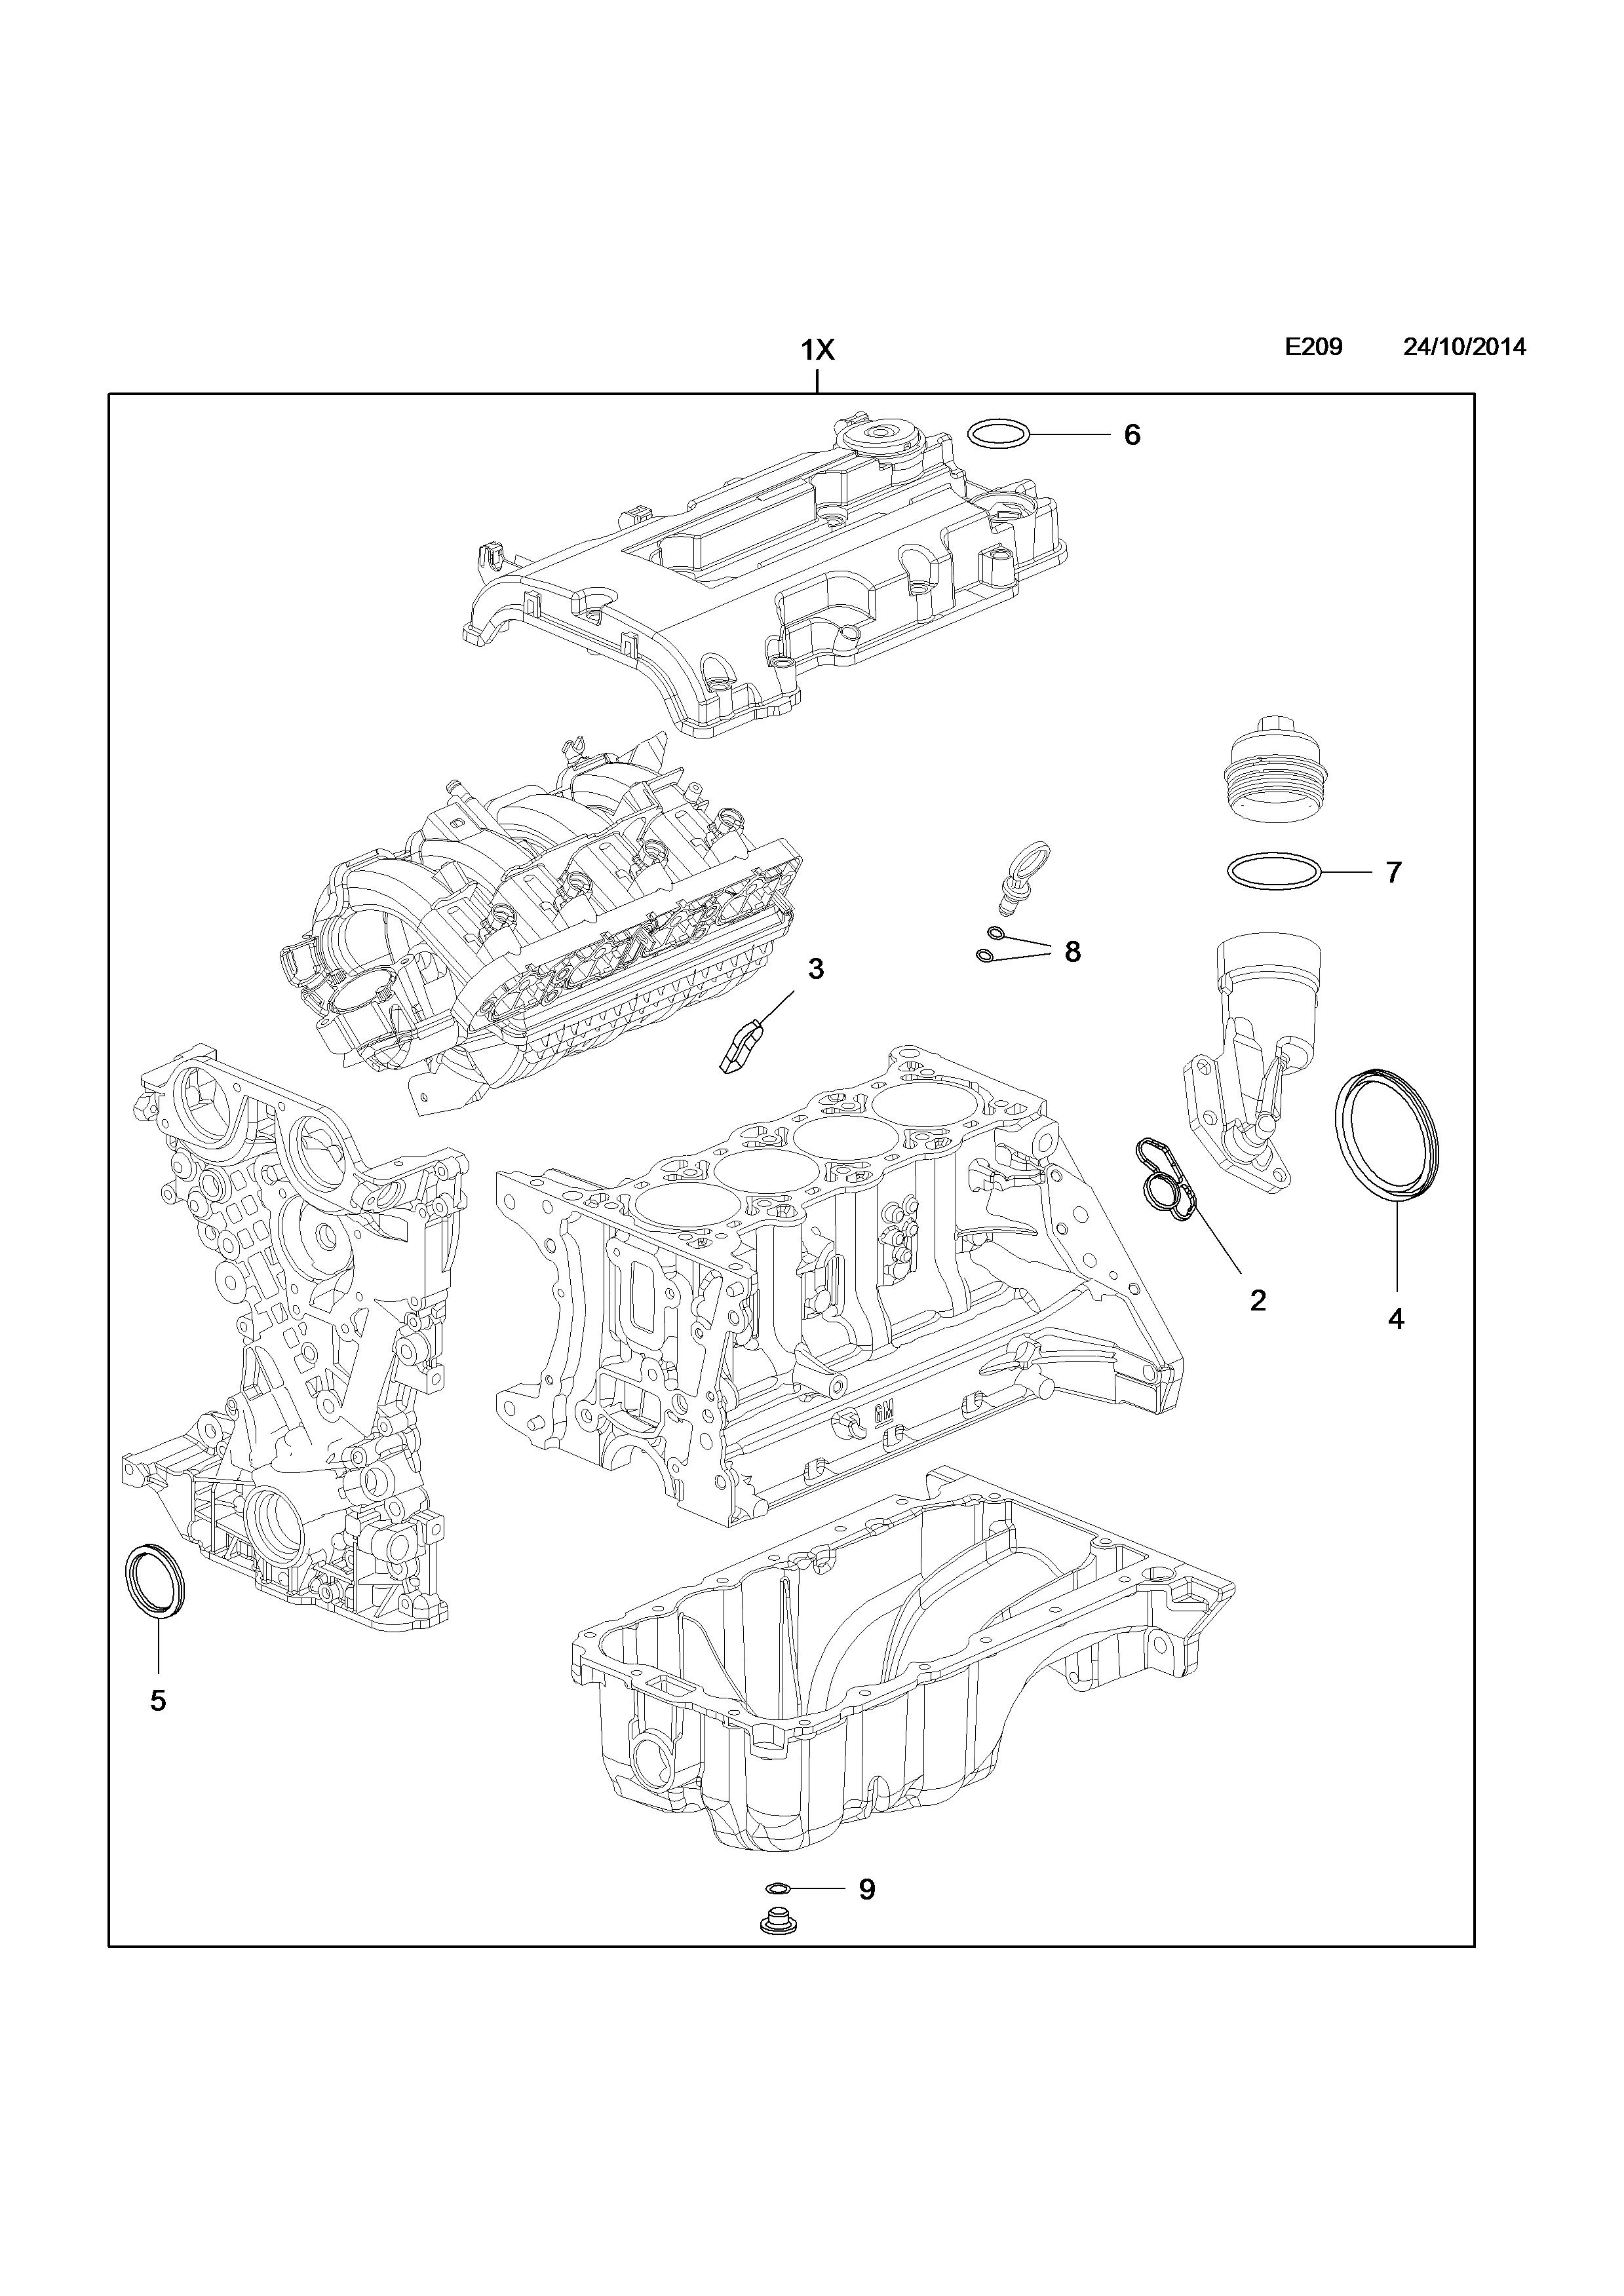 opel corsa e 2015 e engine and clutch 3 b14xej ldd b14xel 2015 Opel Sport list of parts